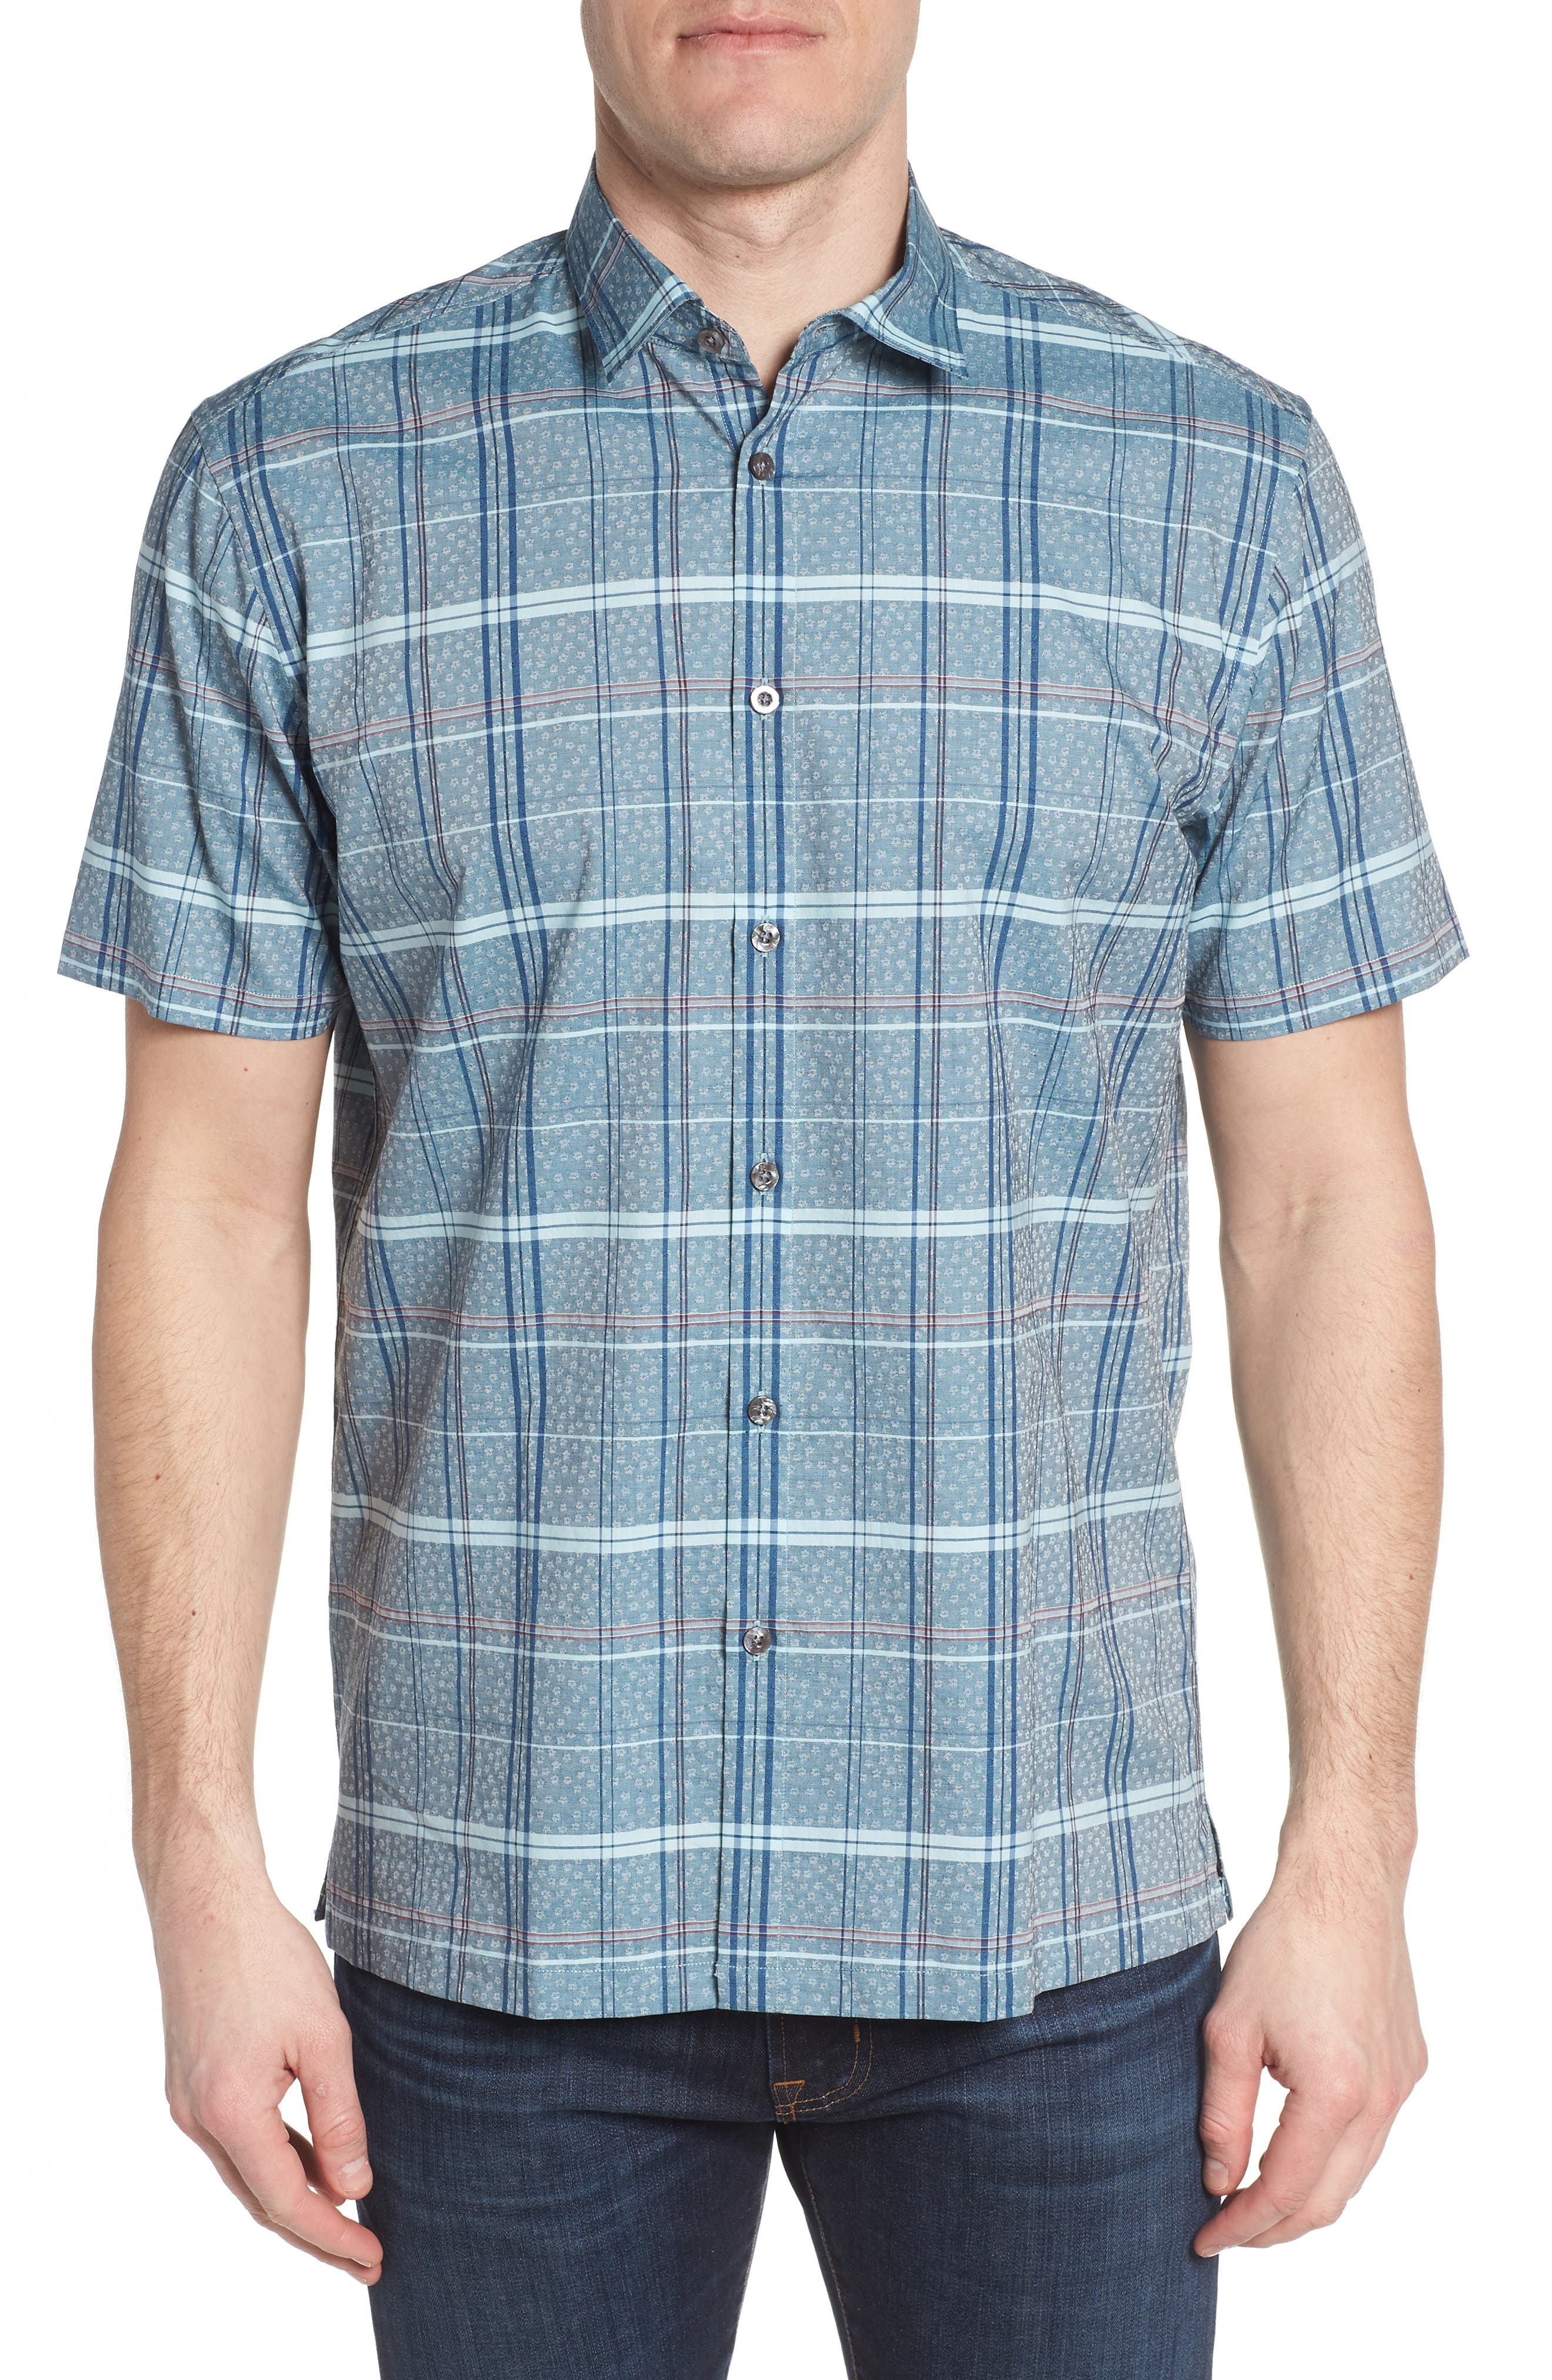 Vacaso Regular Fit Plaid Jacquard Sport Shirt,                             Main thumbnail 1, color,                             Water